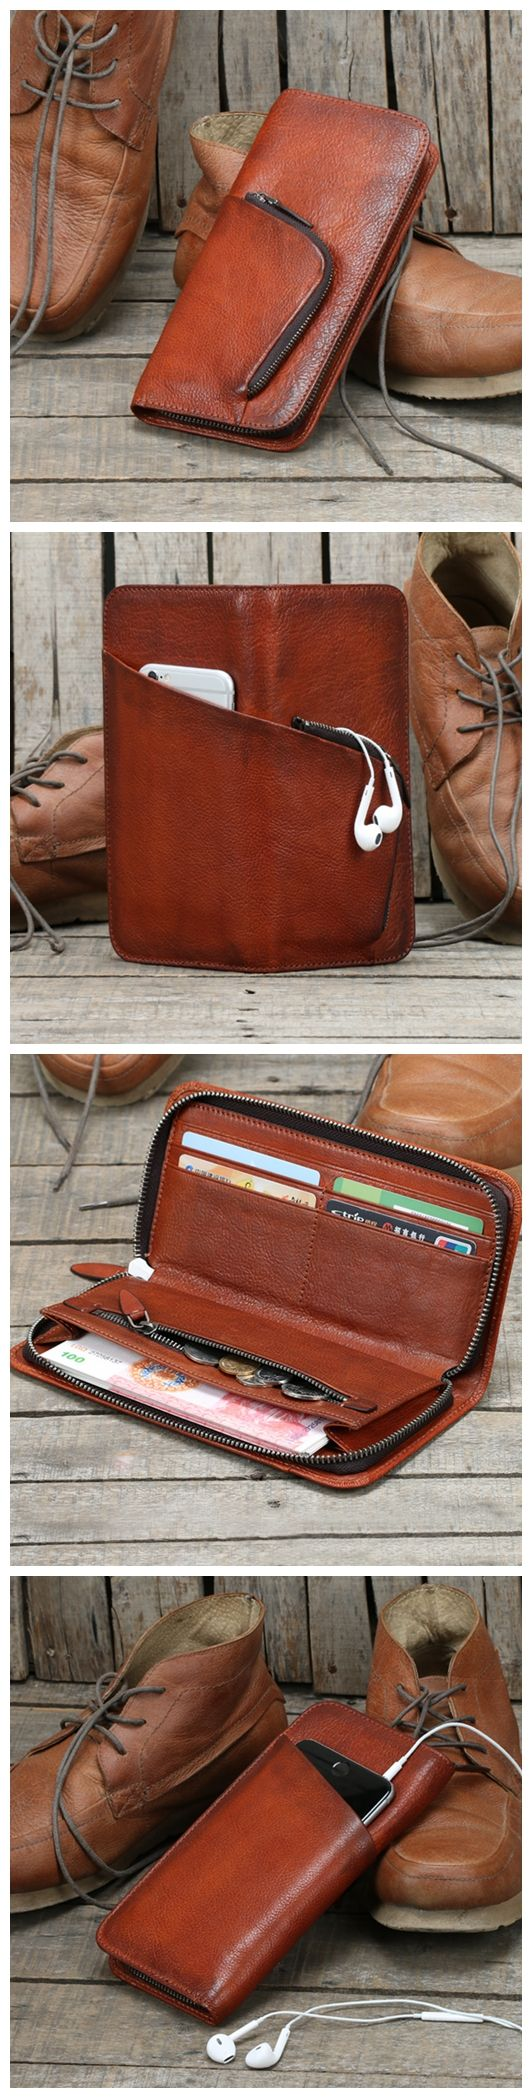 Handmade Long Leather Wallet Card Holder Vintage Brown Leather iPhone Wallet MT02 - Brown